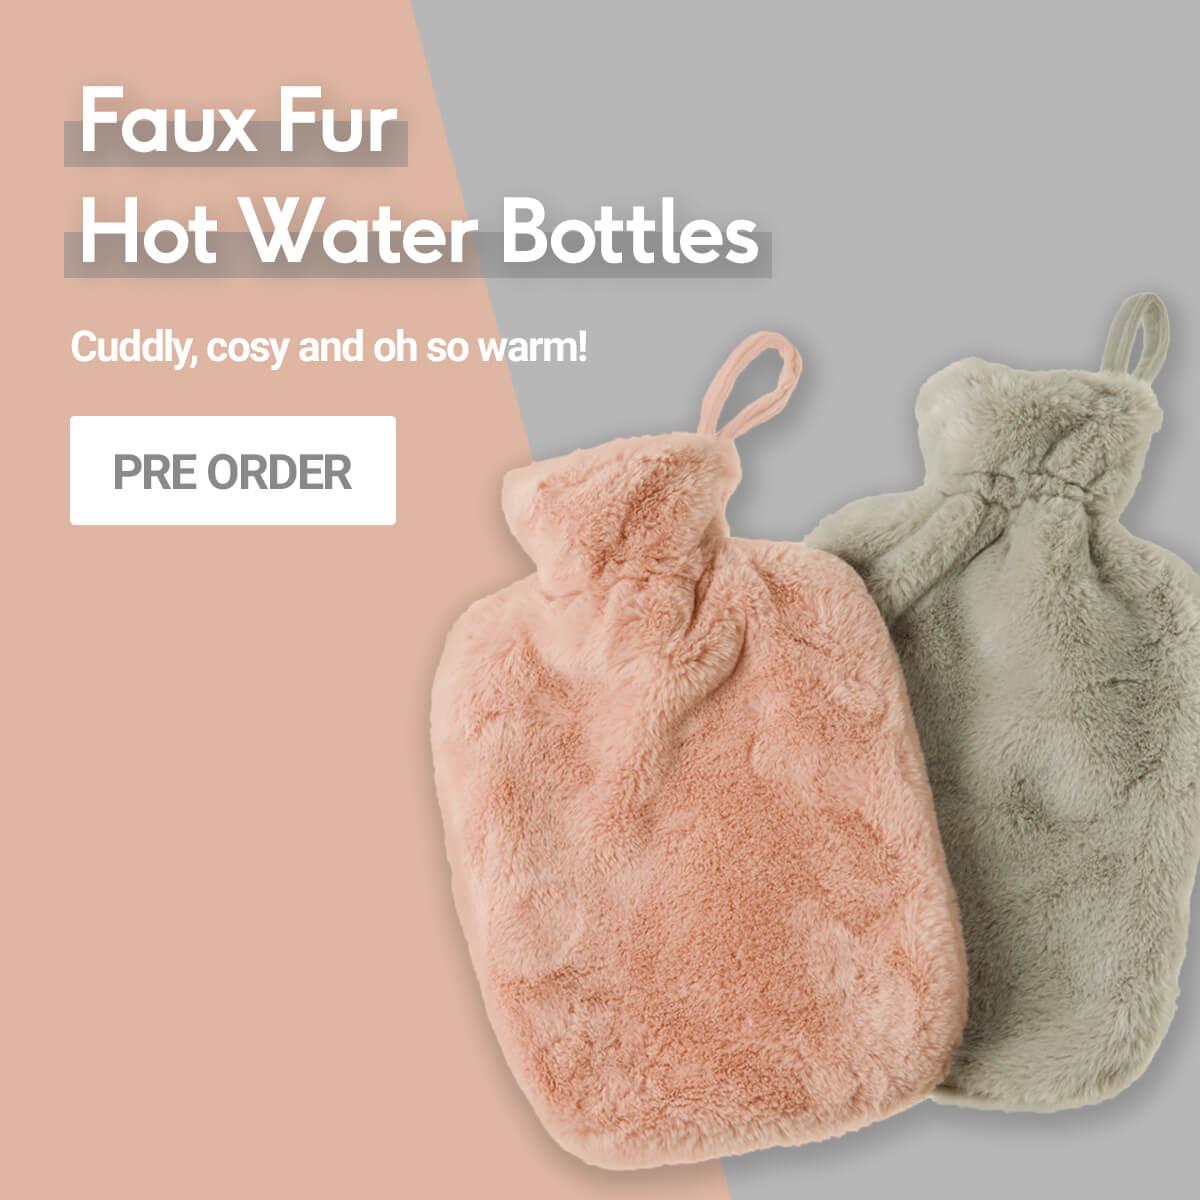 Faux Fur Hot Water Bottles - Pre Order